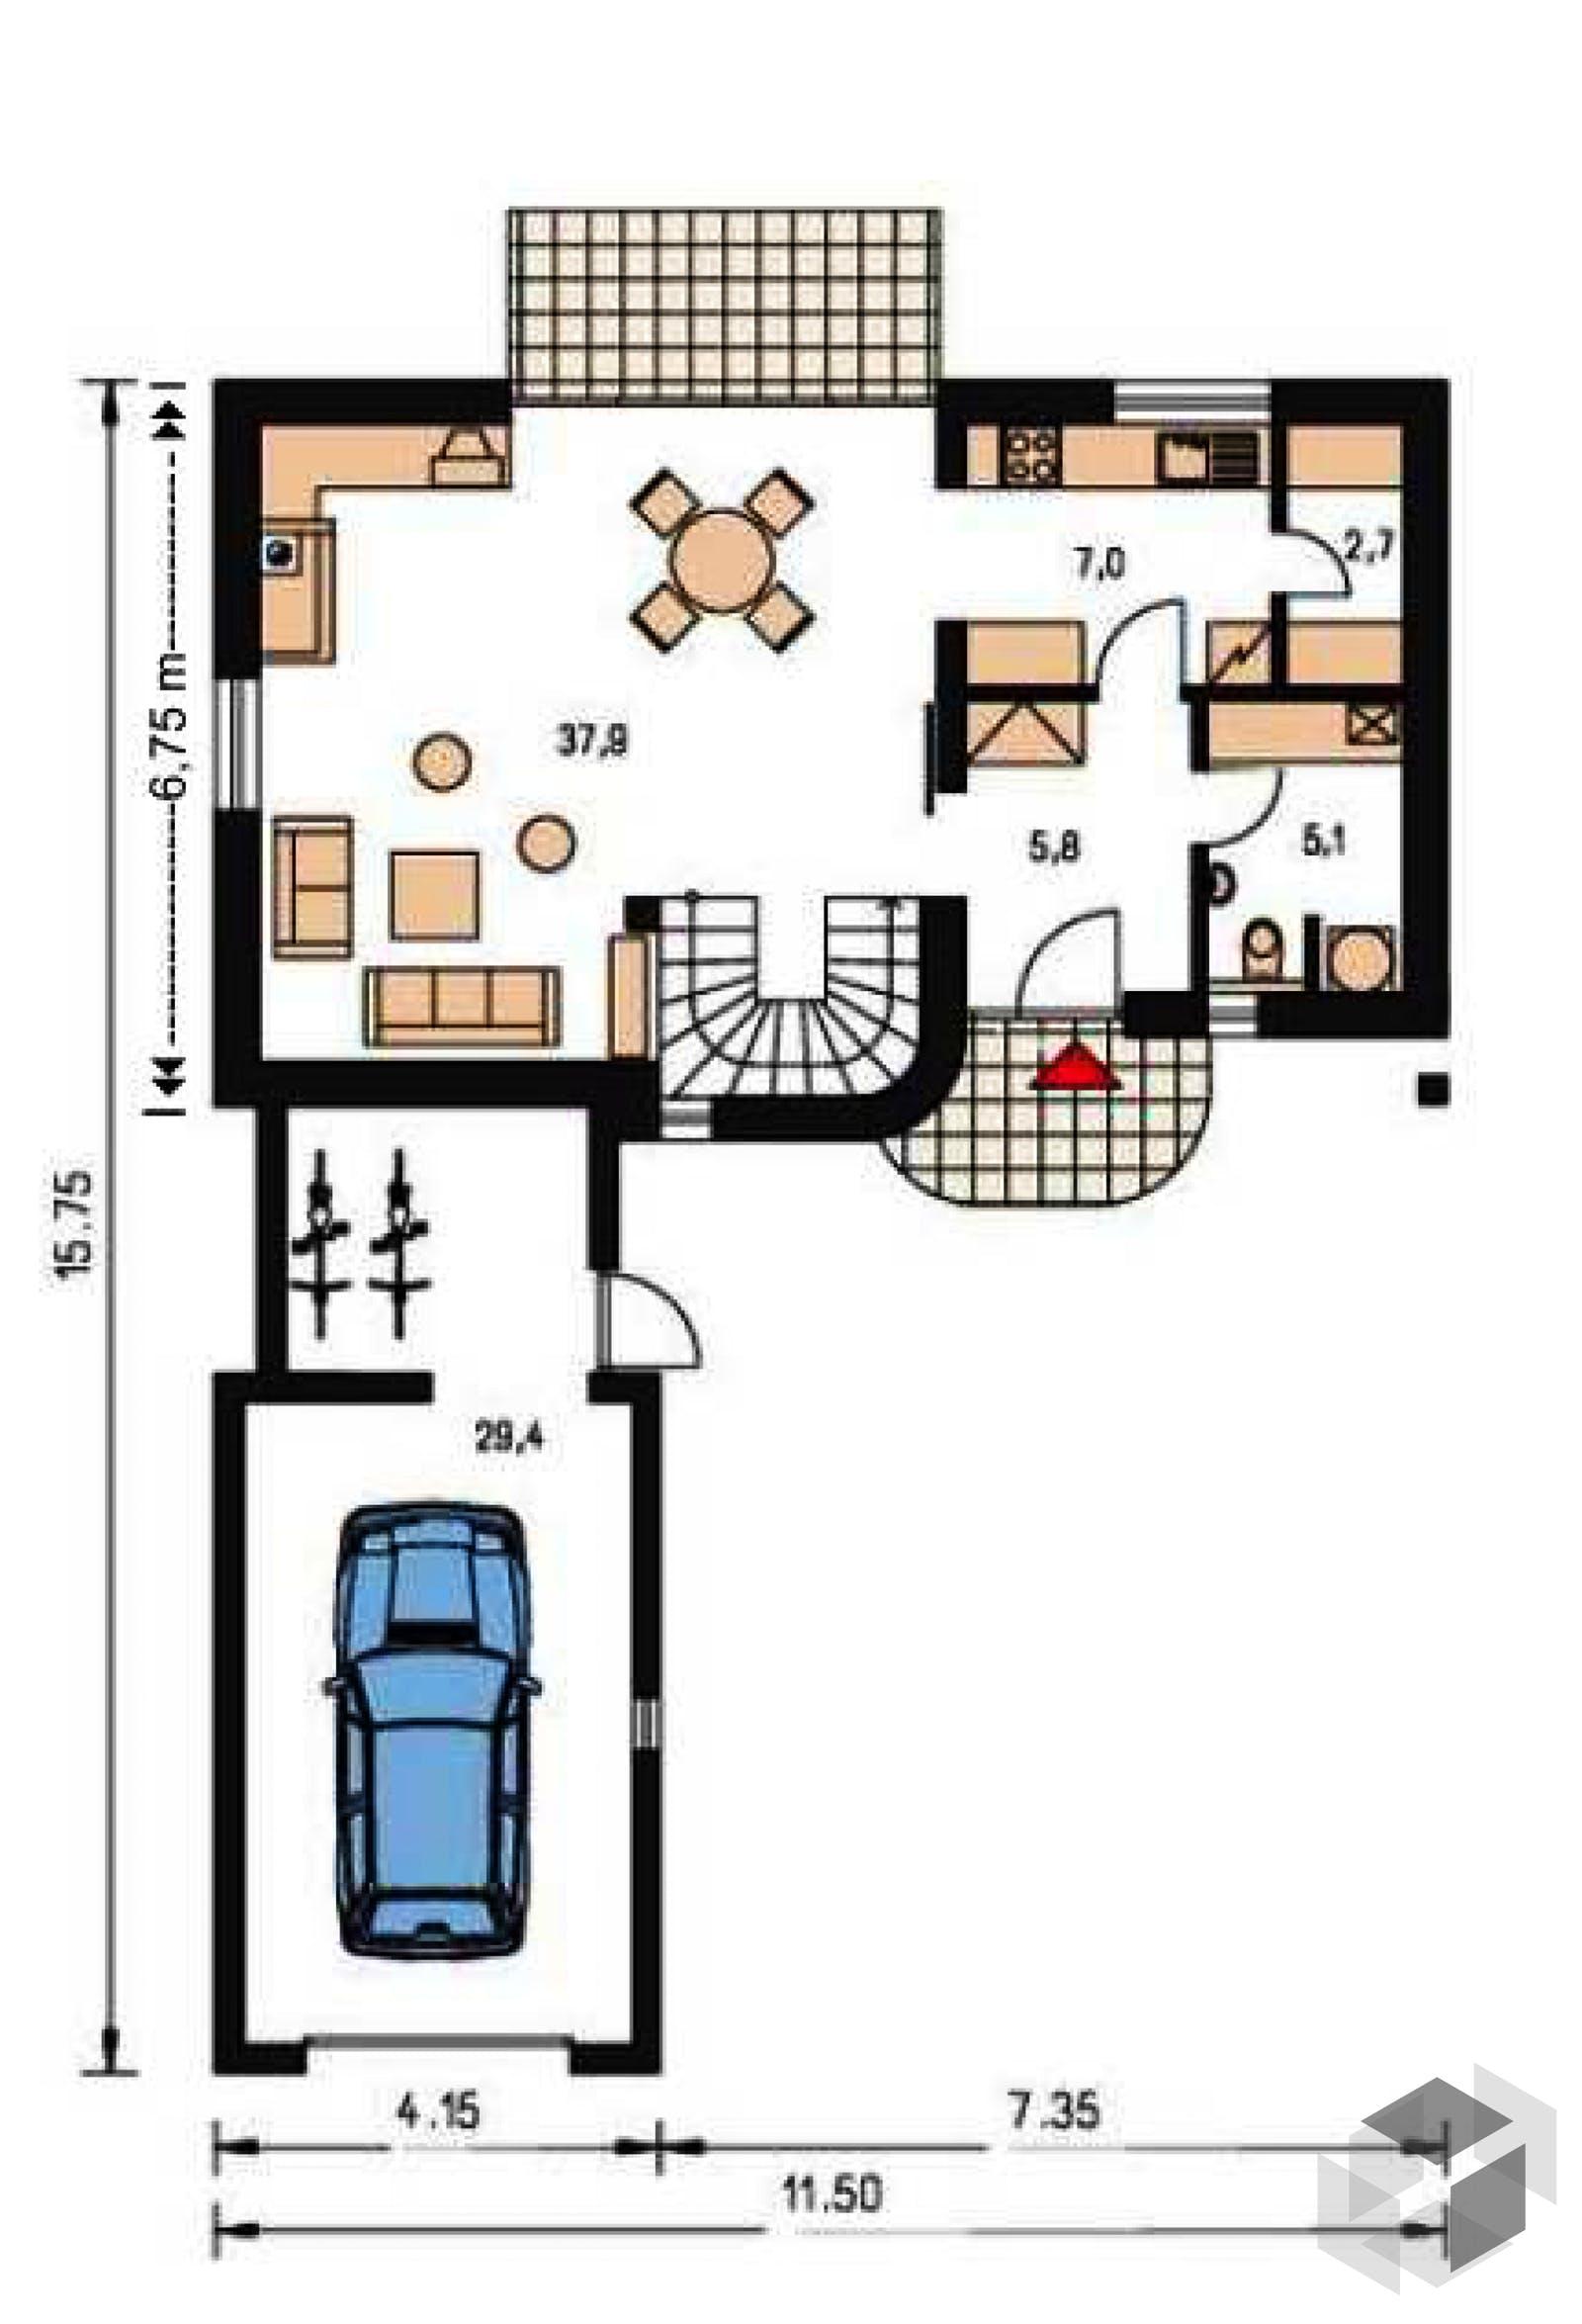 domino plus inactive von cmf creativ massiv flexibel komplette daten bersicht. Black Bedroom Furniture Sets. Home Design Ideas